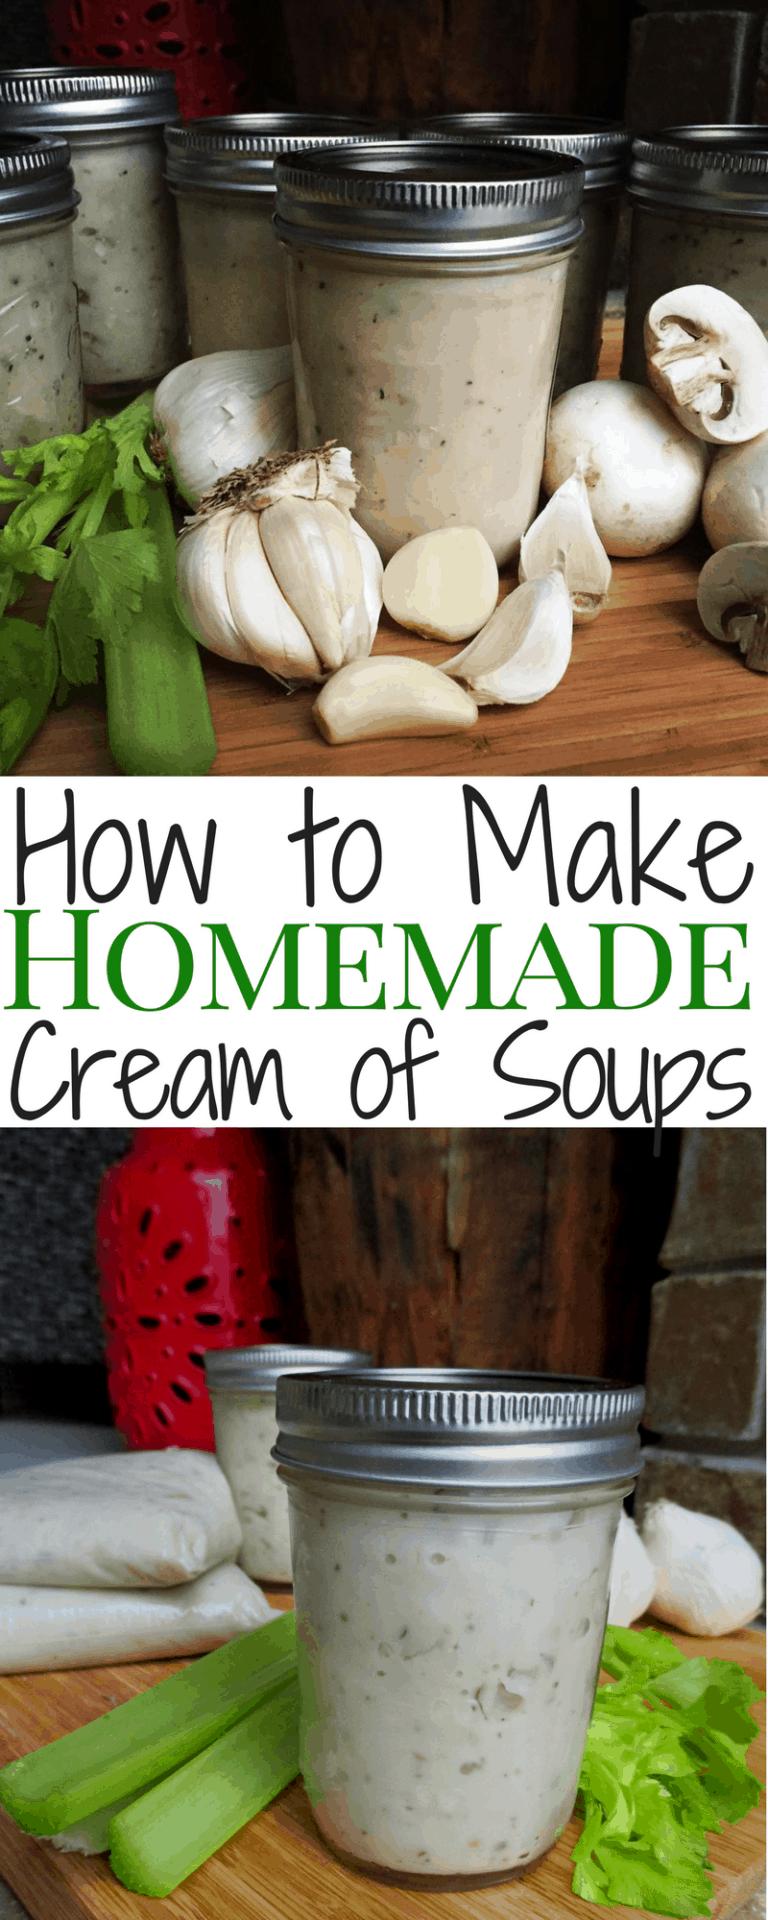 "Homemade ""Cream of"" Soups (Chicken, Celery, Mushroom)"